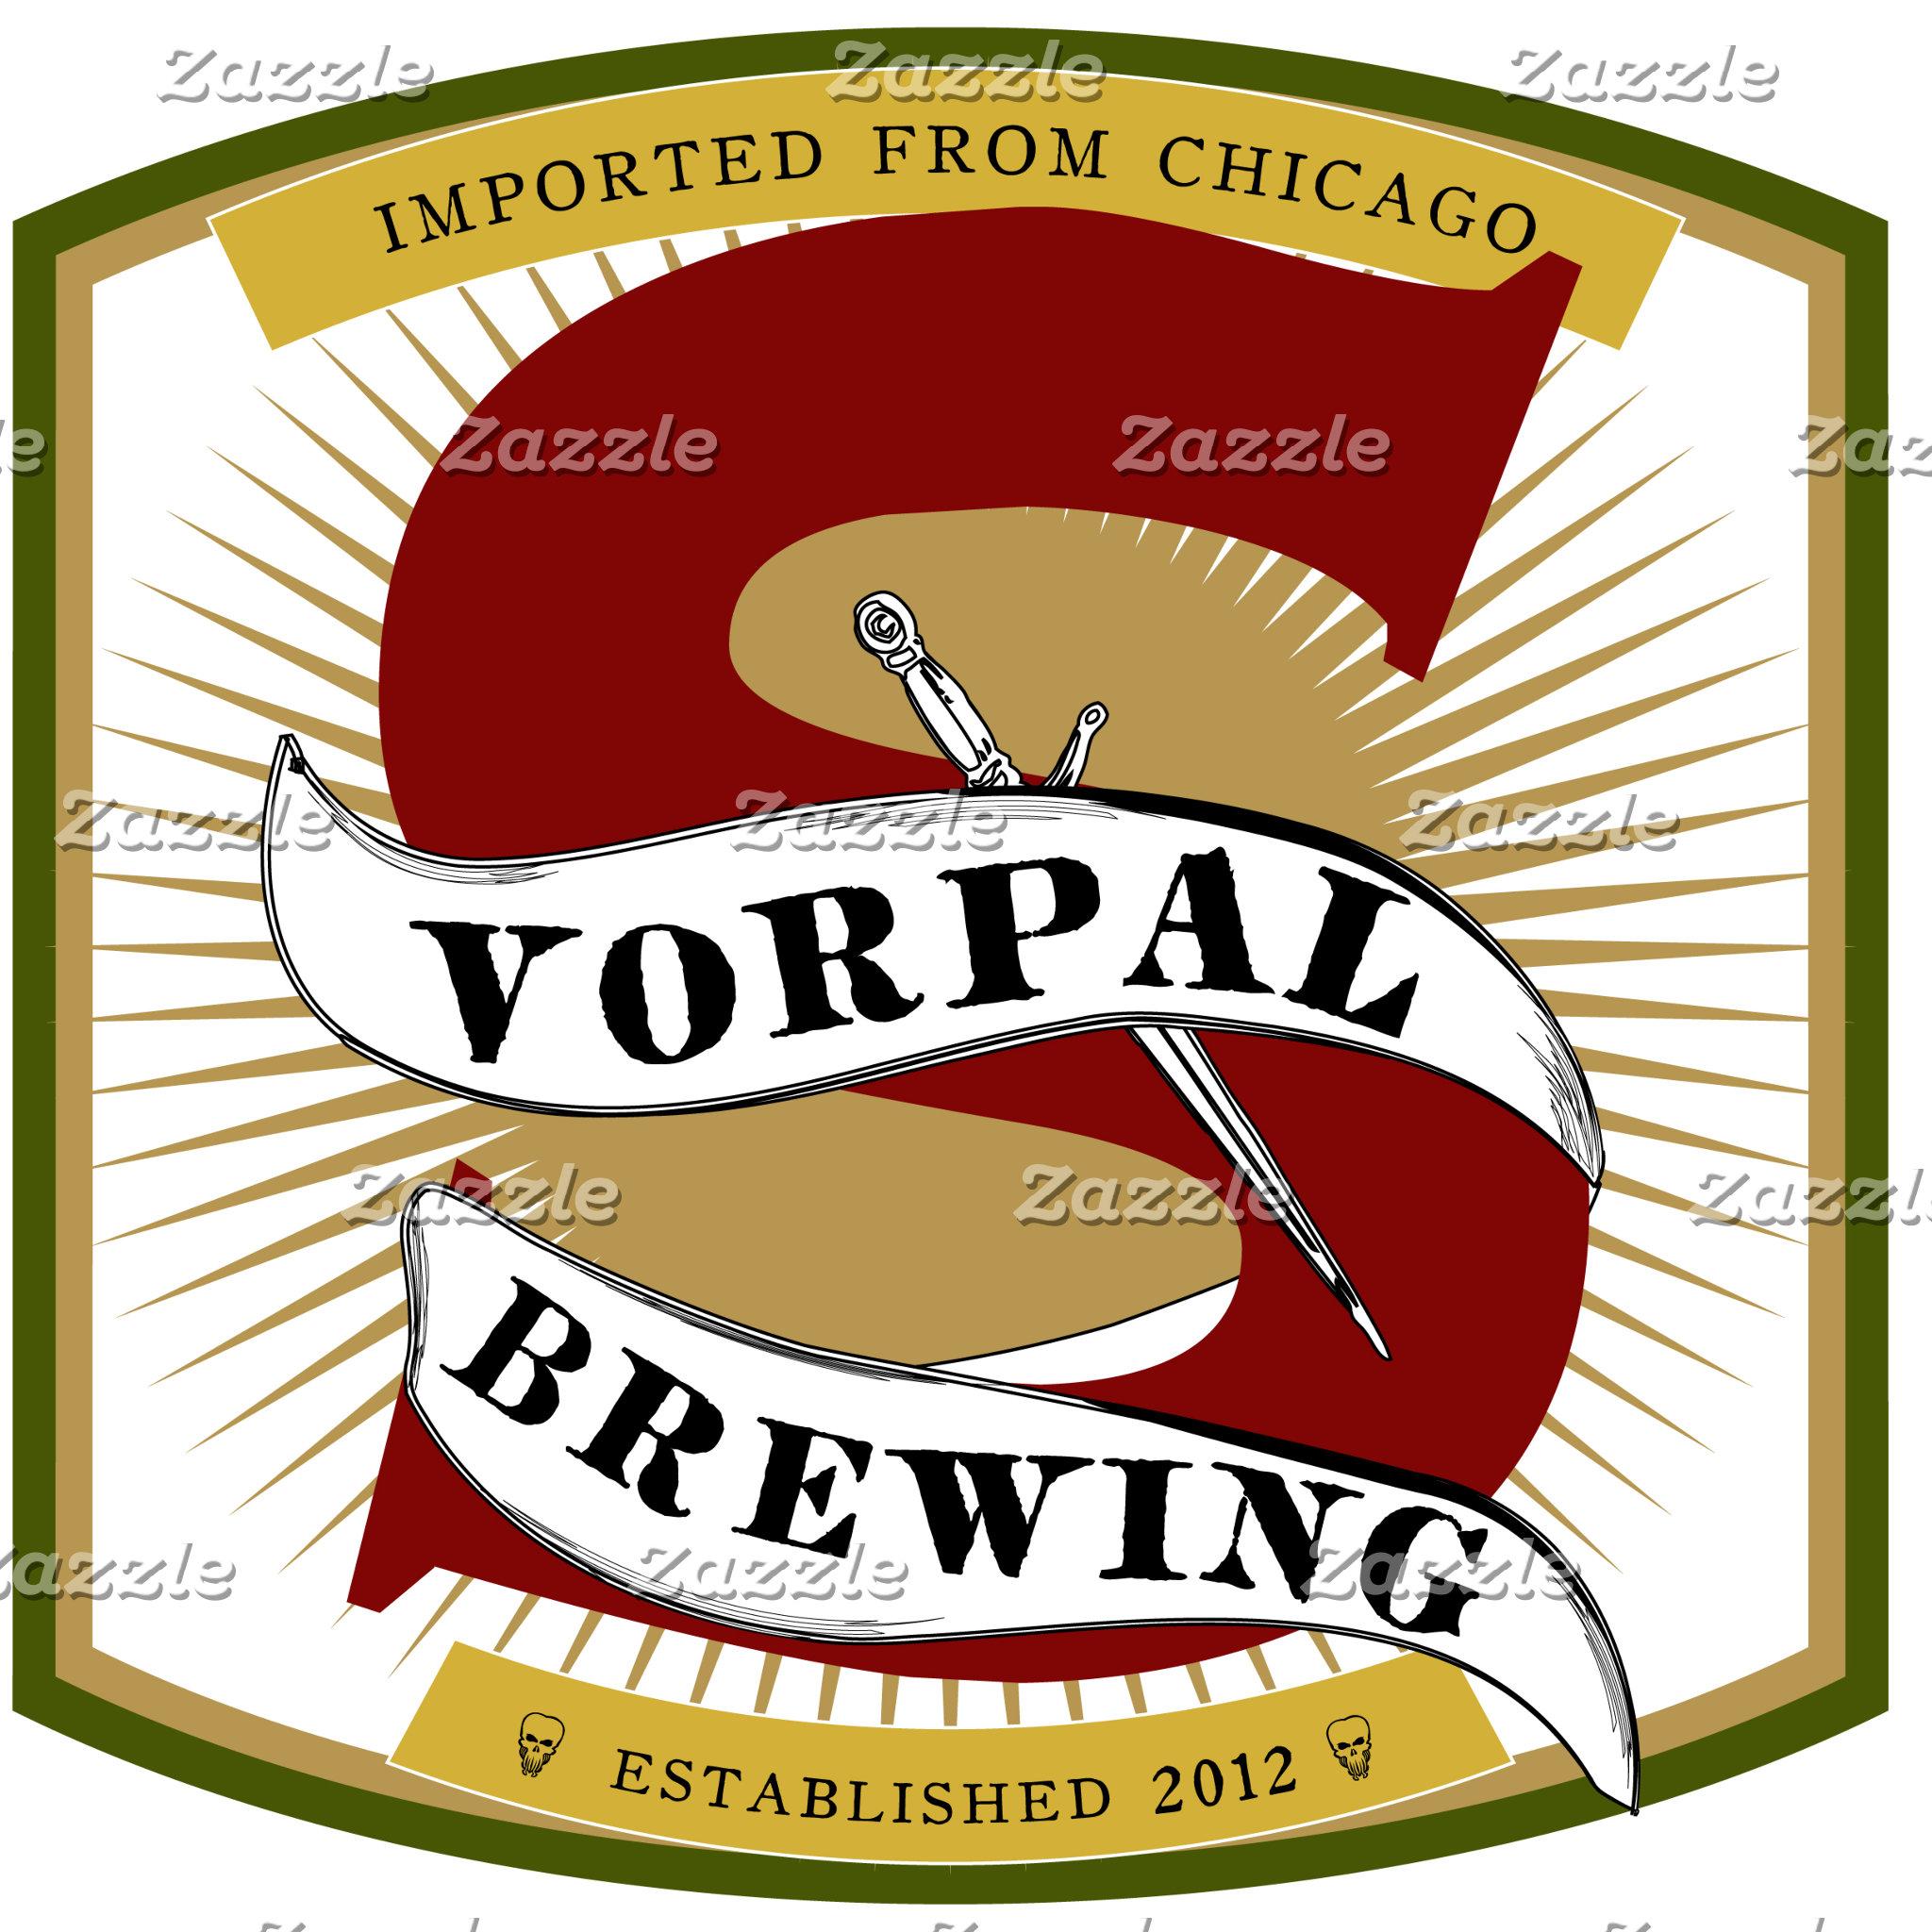 Vorpal Brewing